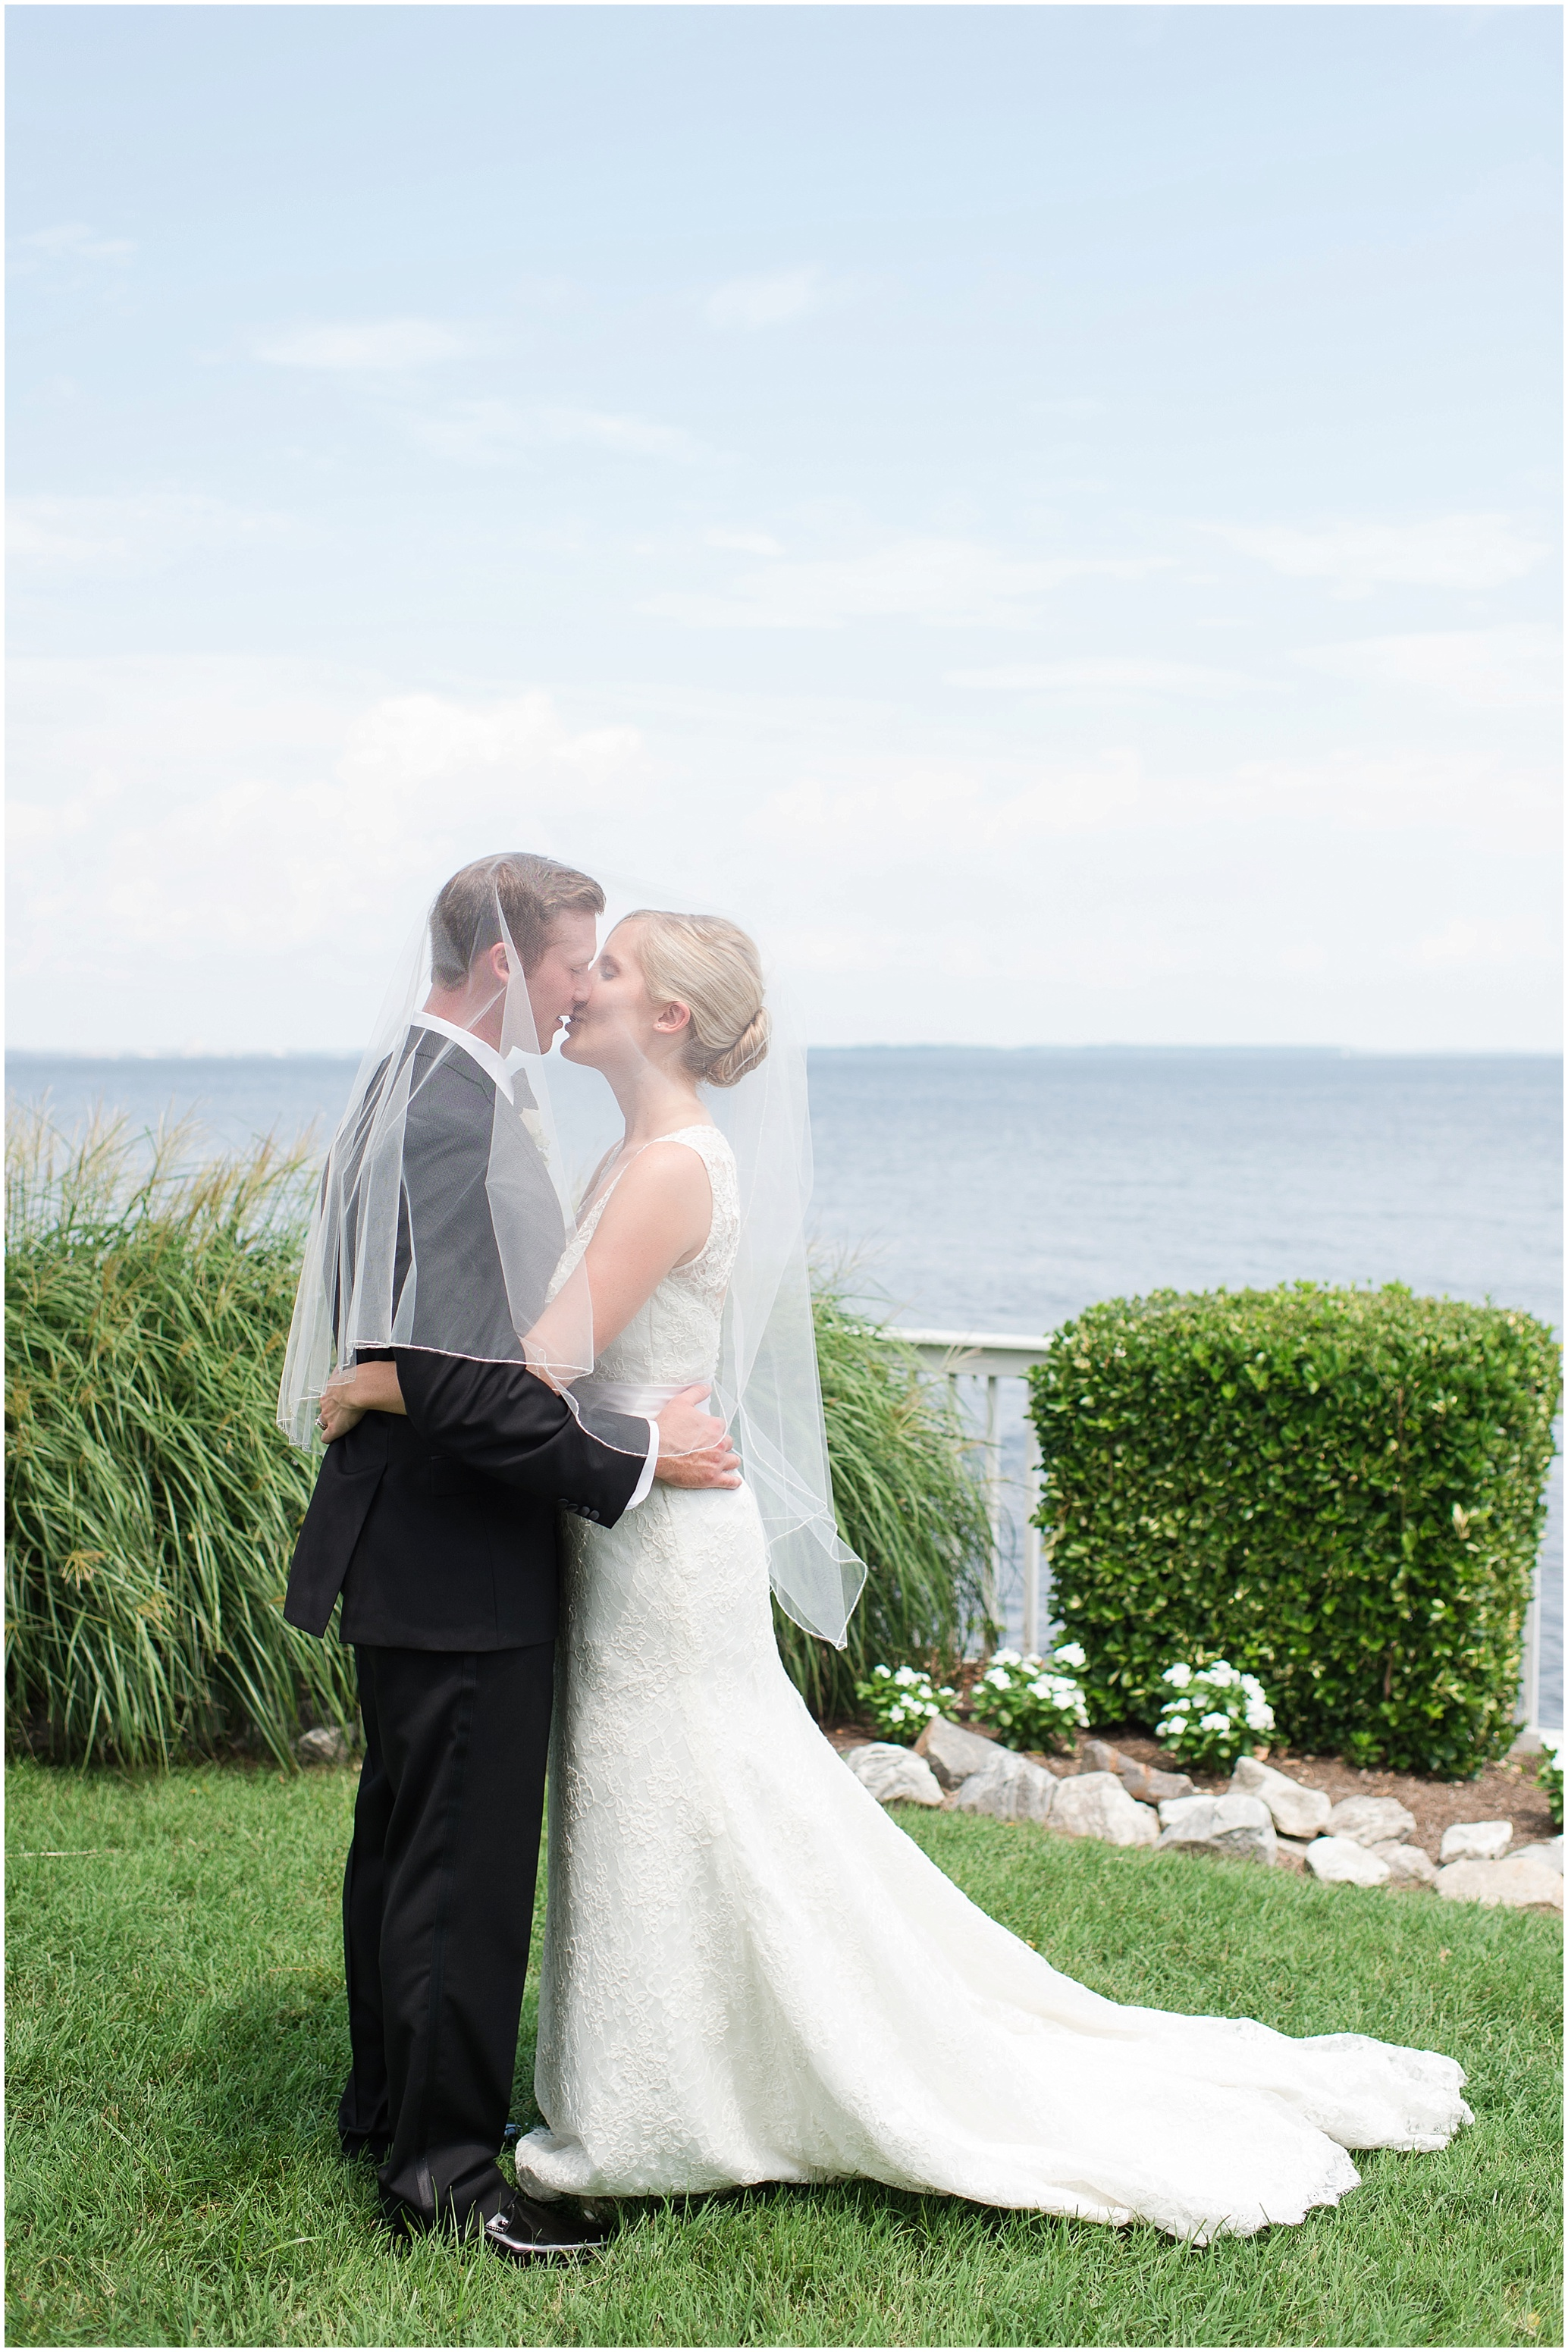 Hannah Leigh Photography Celebrations at the Bay Wedding_0989.jpg